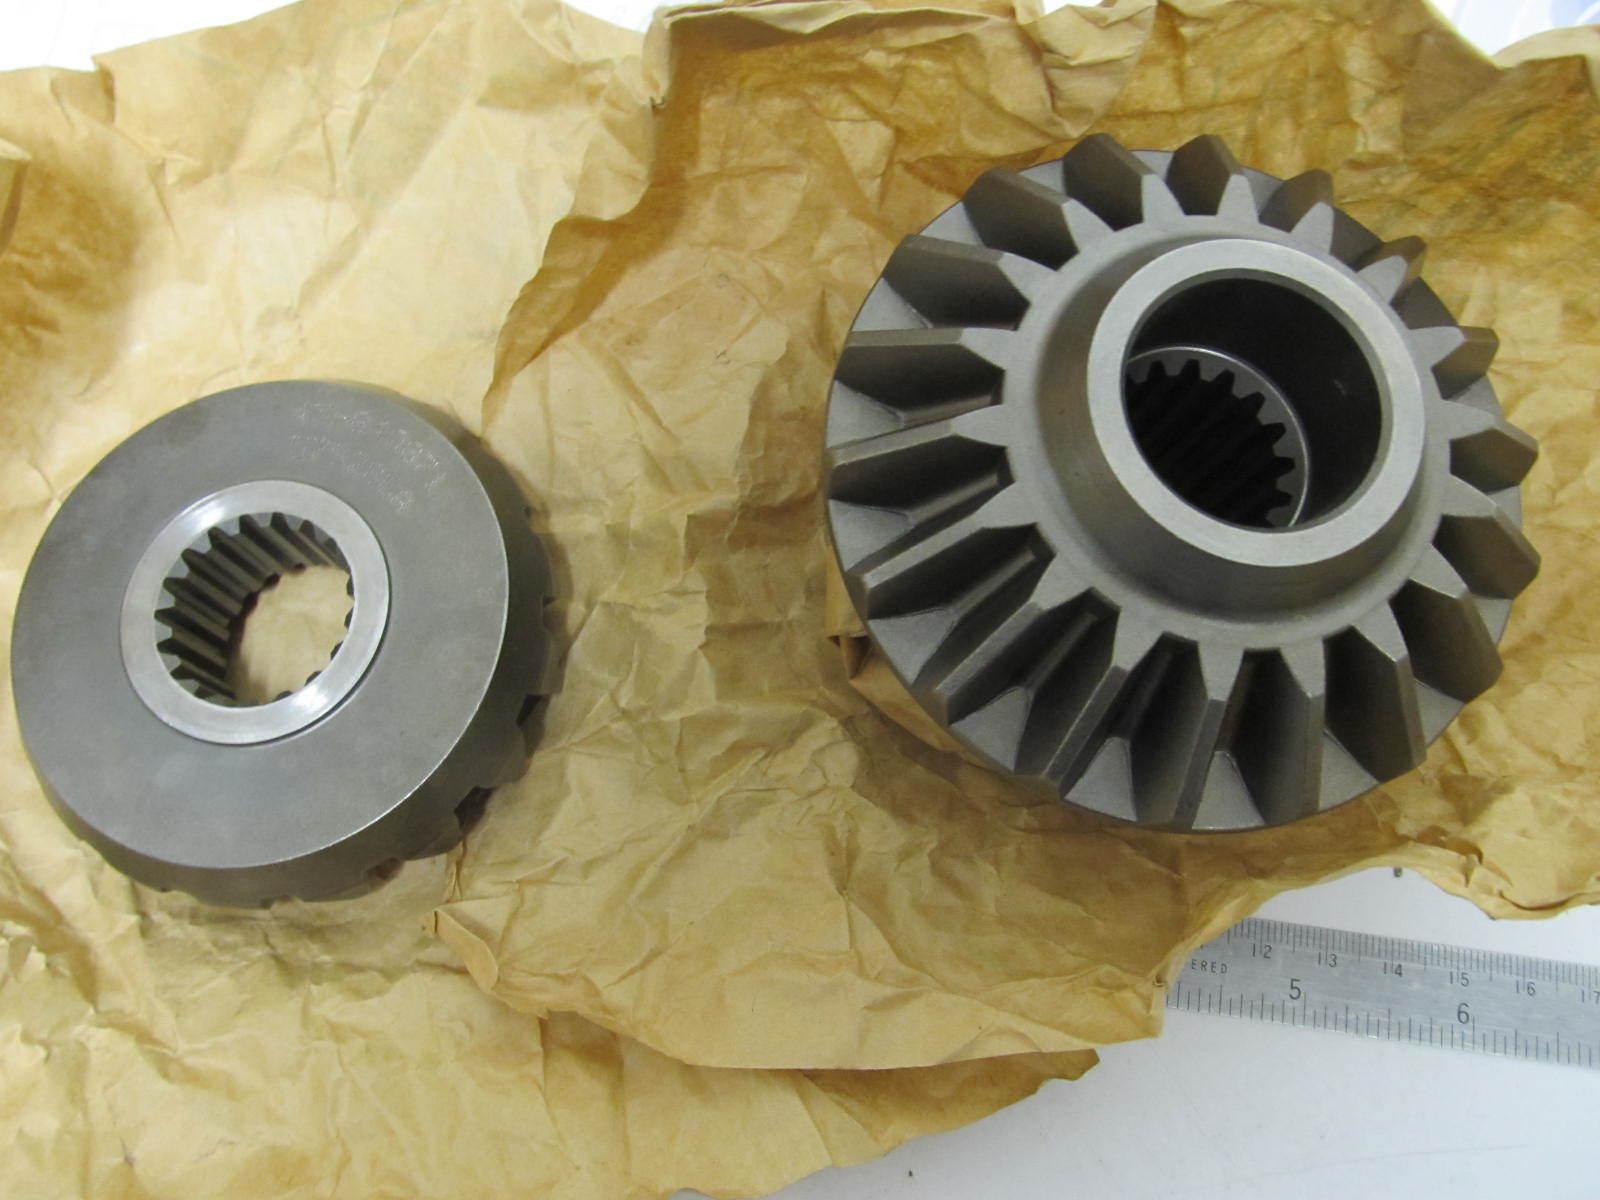 43-840870a1 fits mercruiser bravo stern drive gear set 17/18